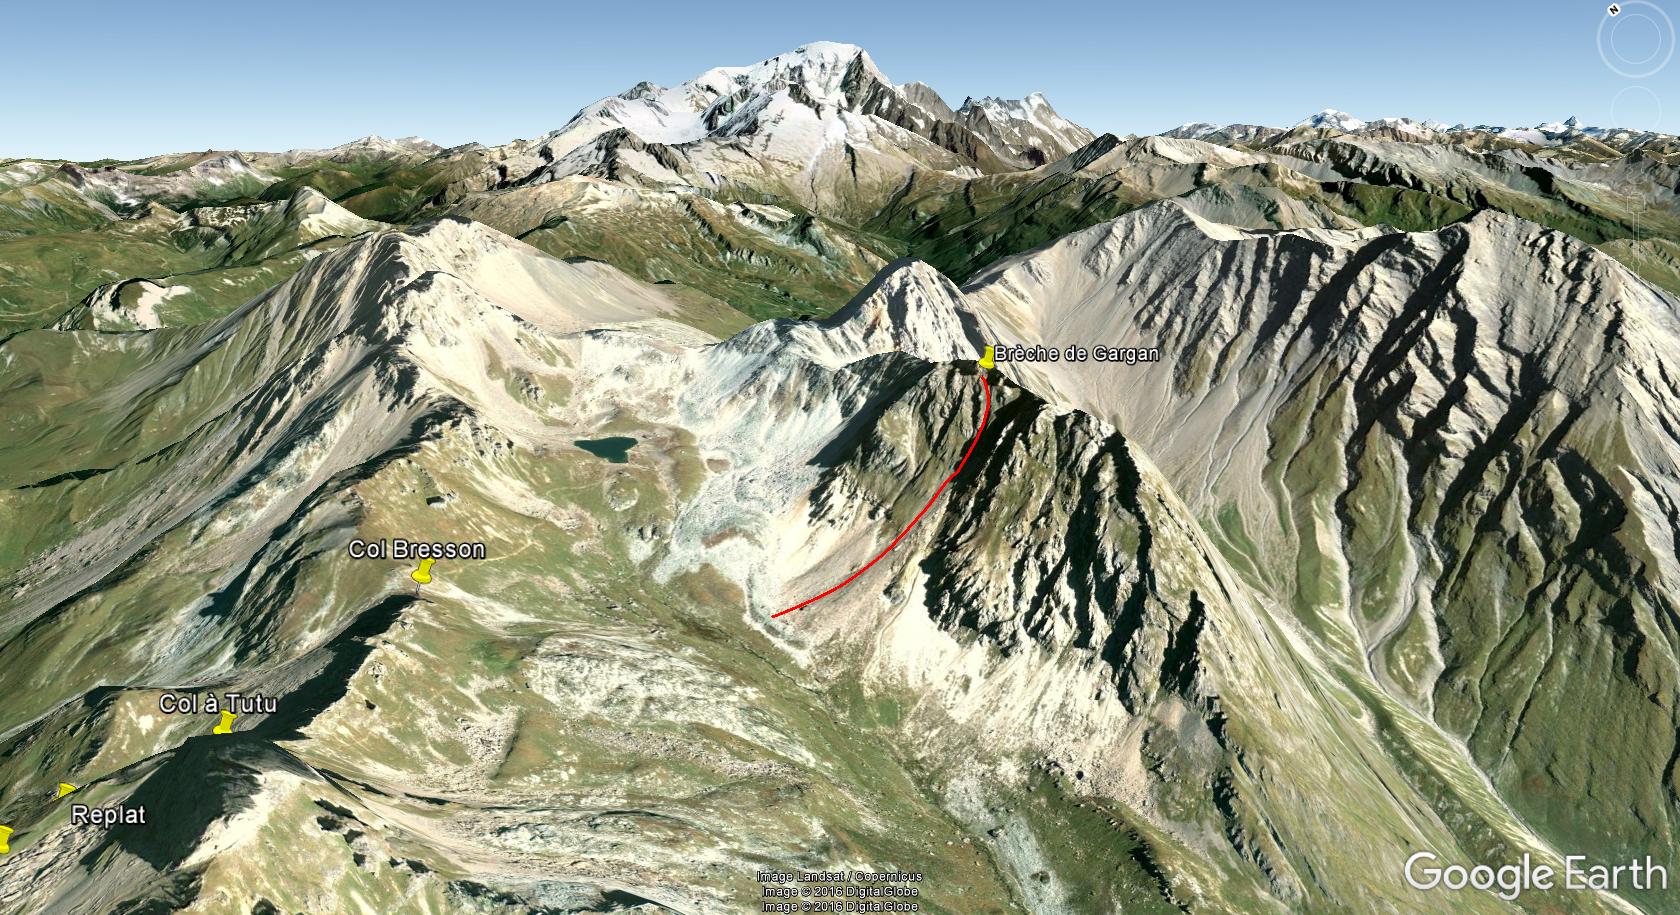 image-google-earth Brèche de Gargan